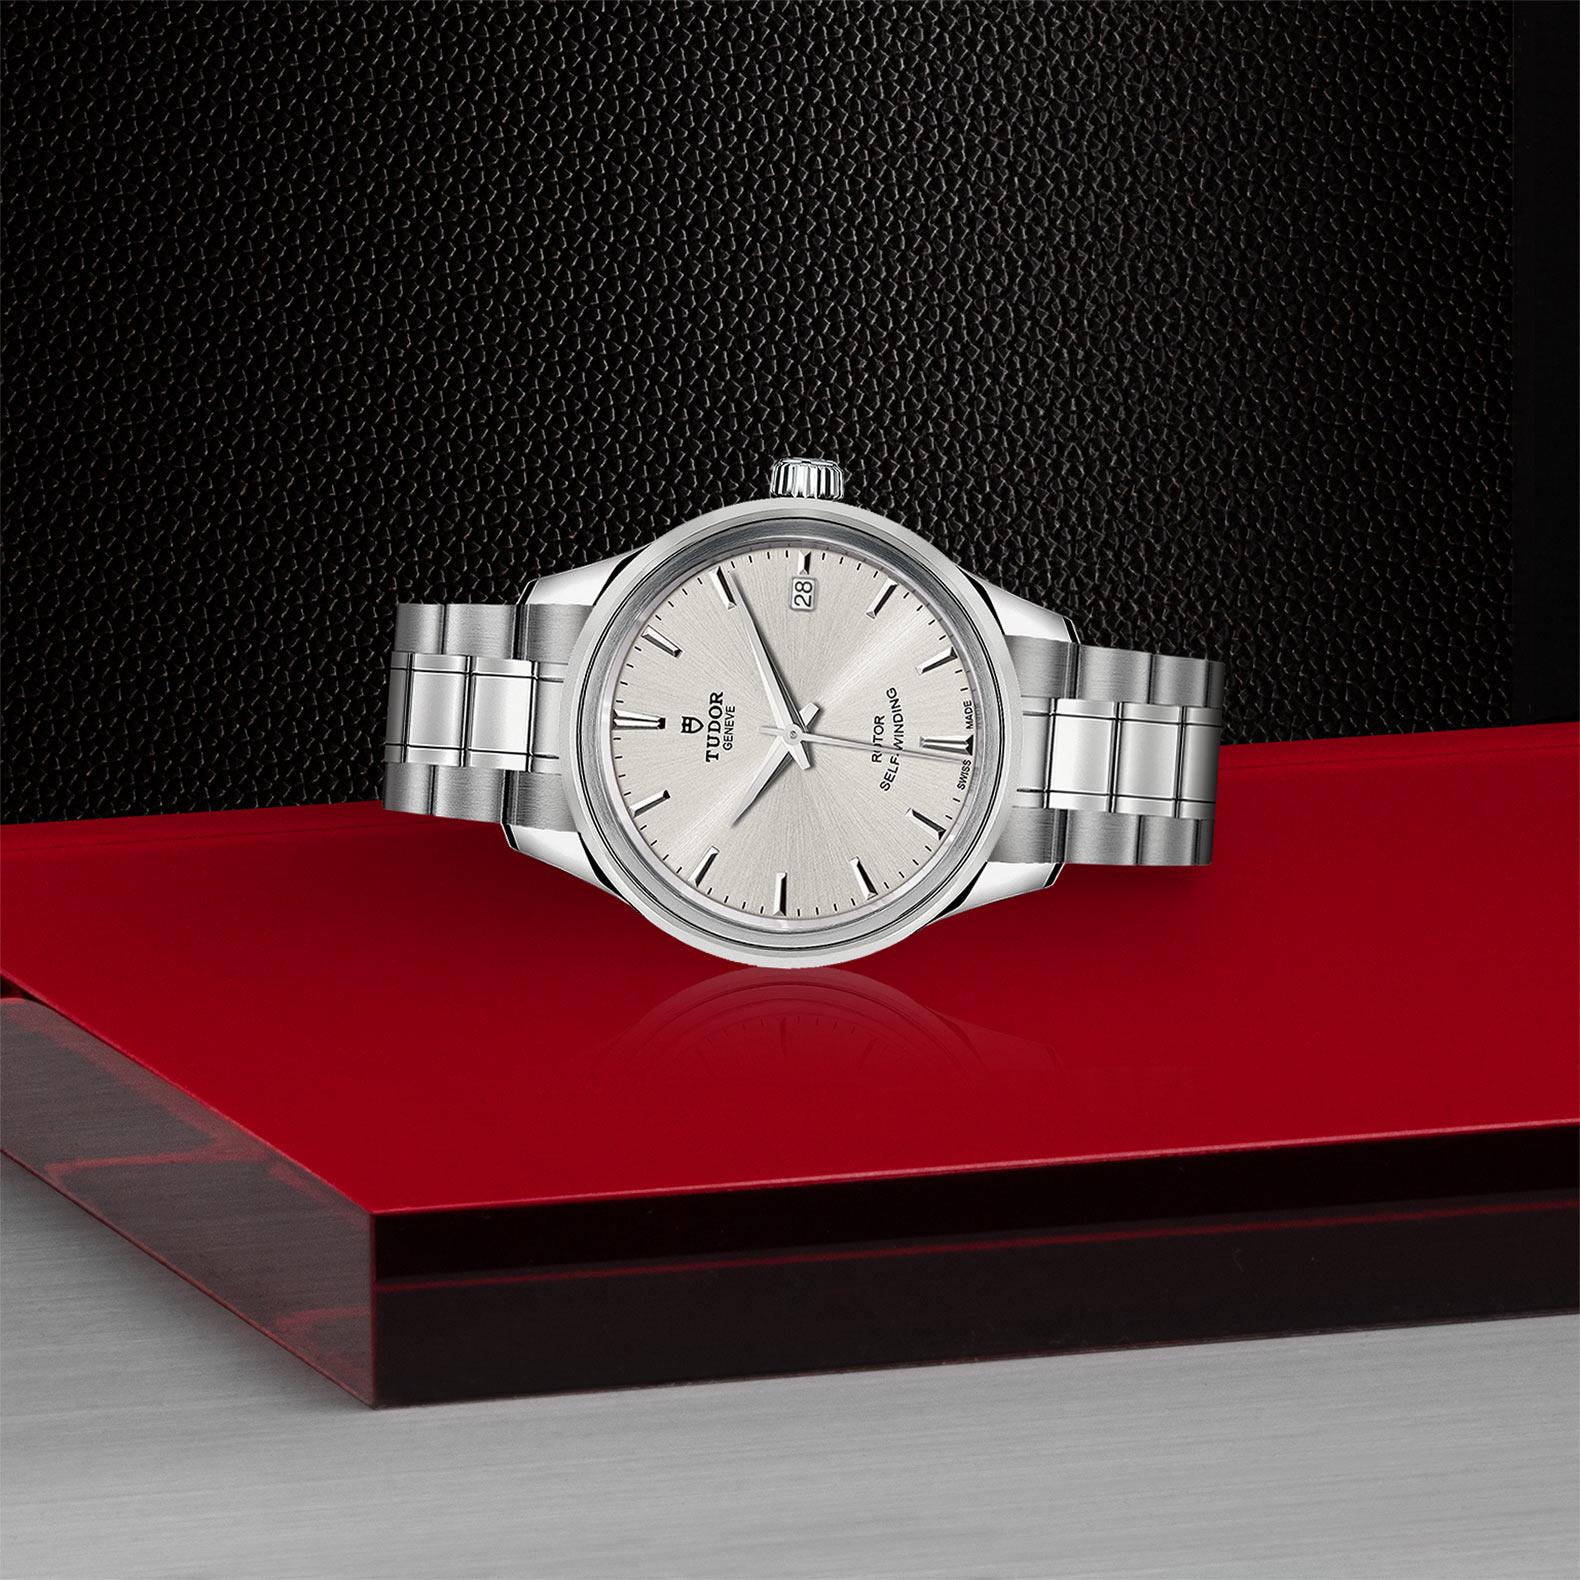 TUDOR Style - M12300-0001